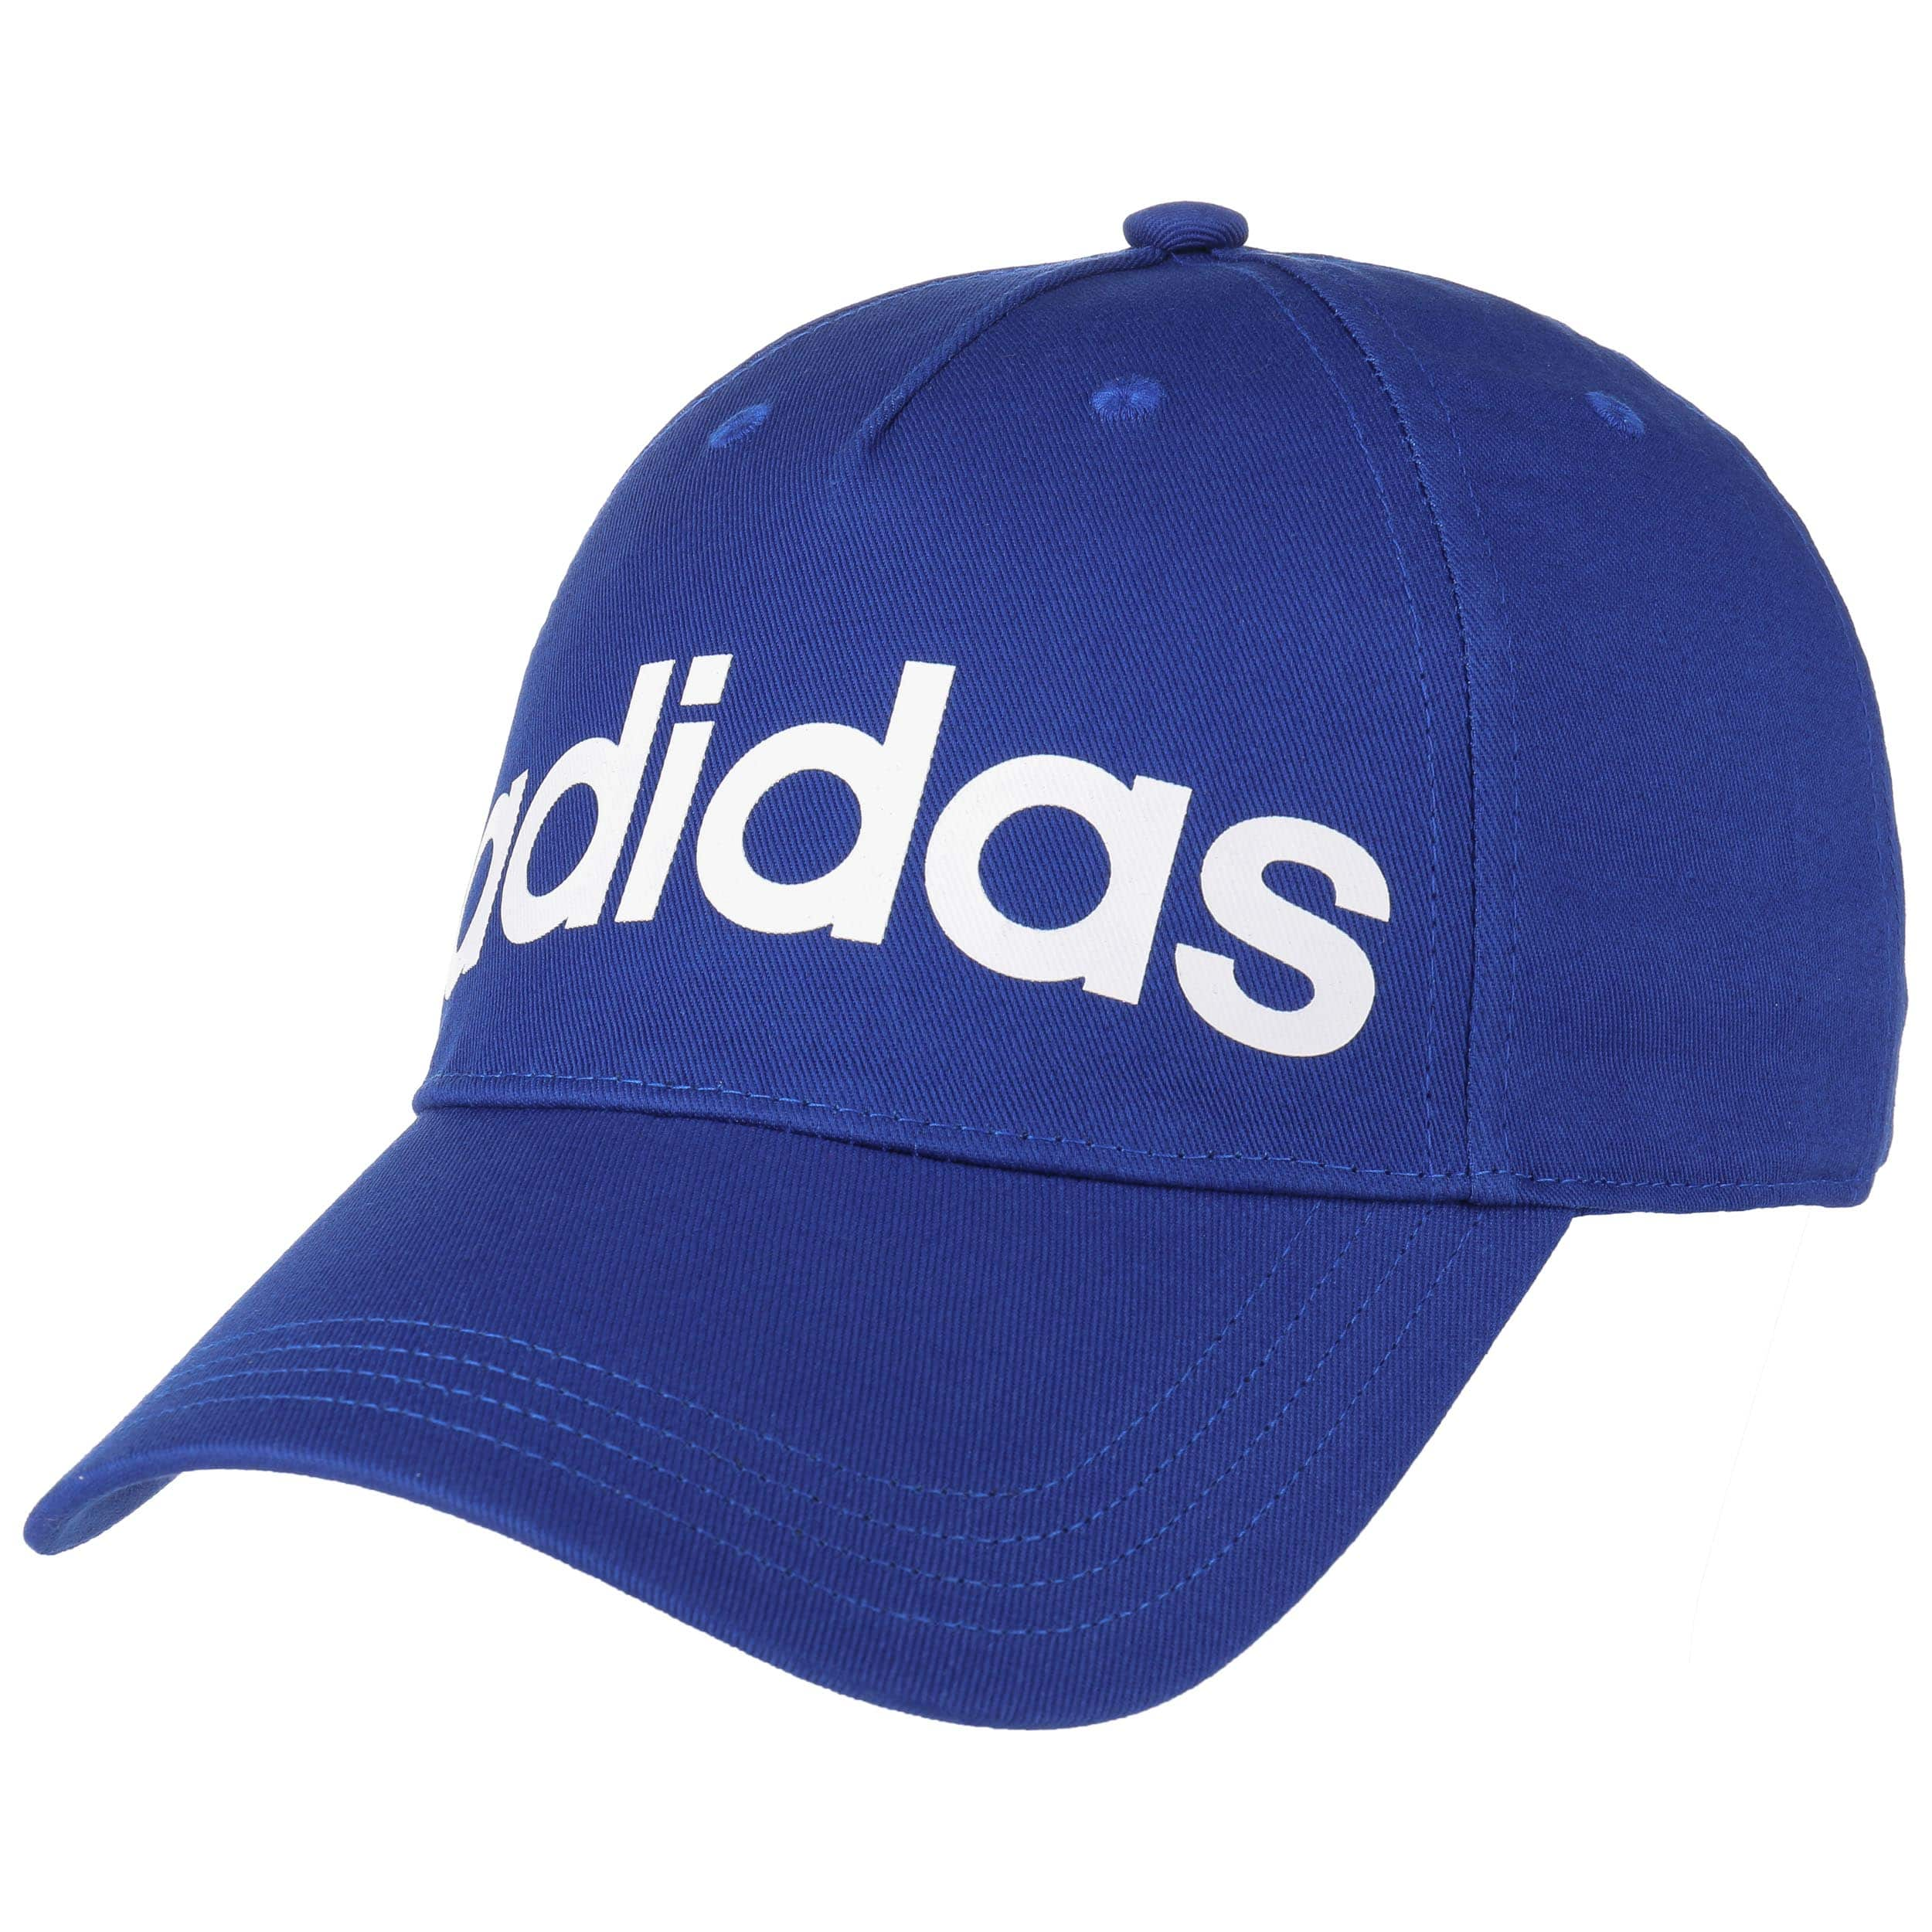 1c3c02b64b6 Daily Cap. by adidas